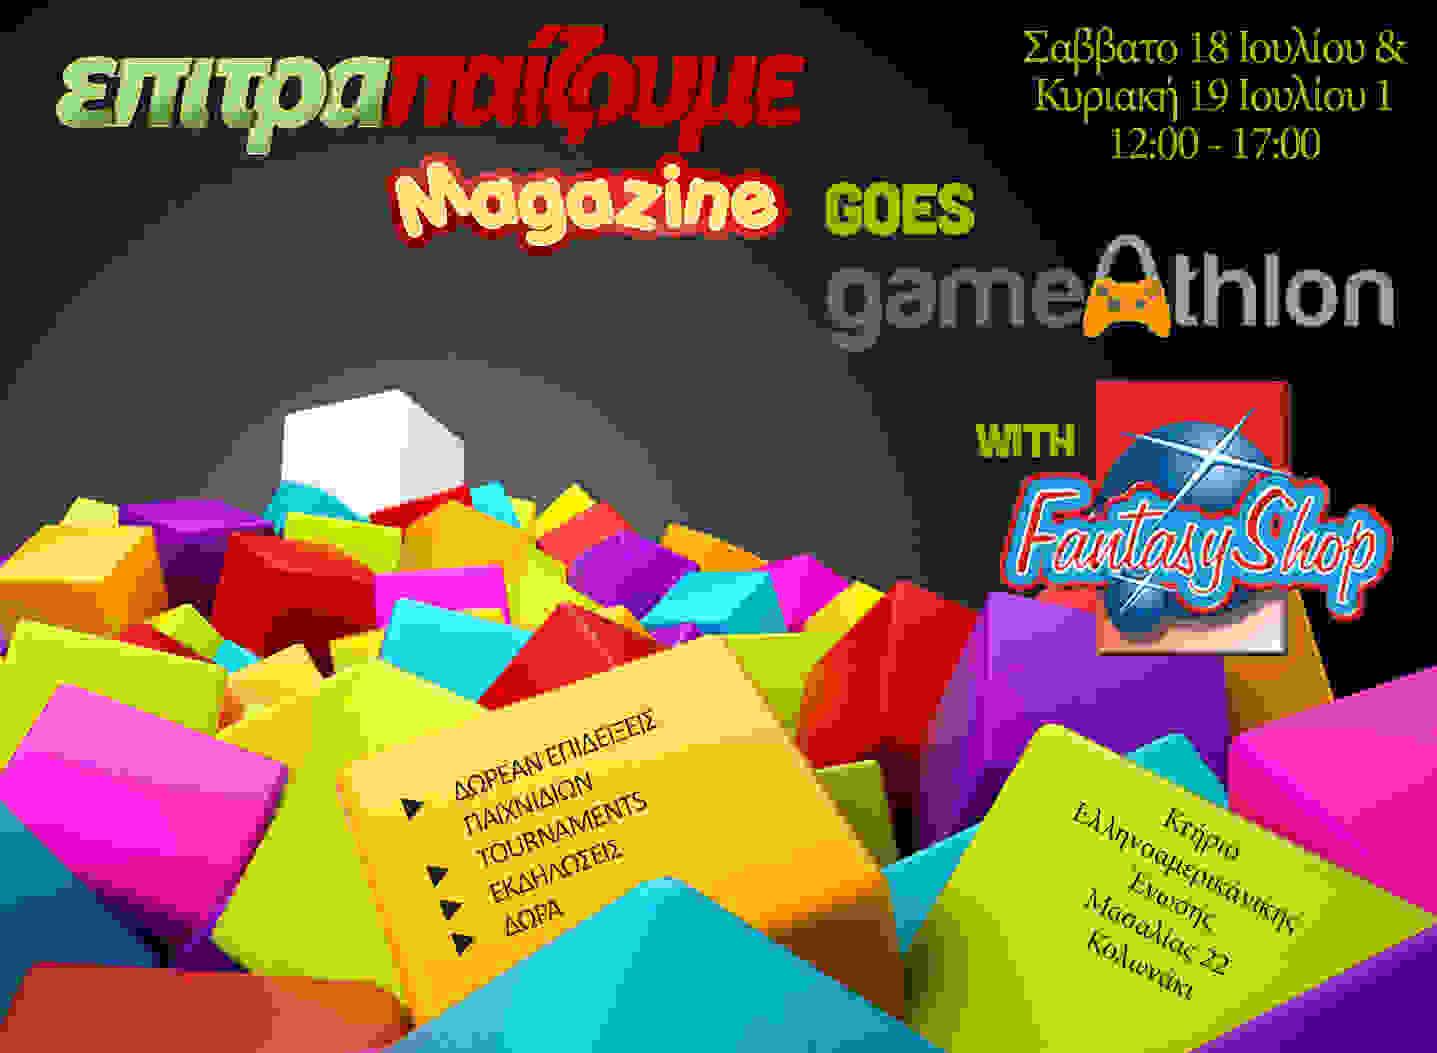 Gameathlon 2015 with Fantasy Shop